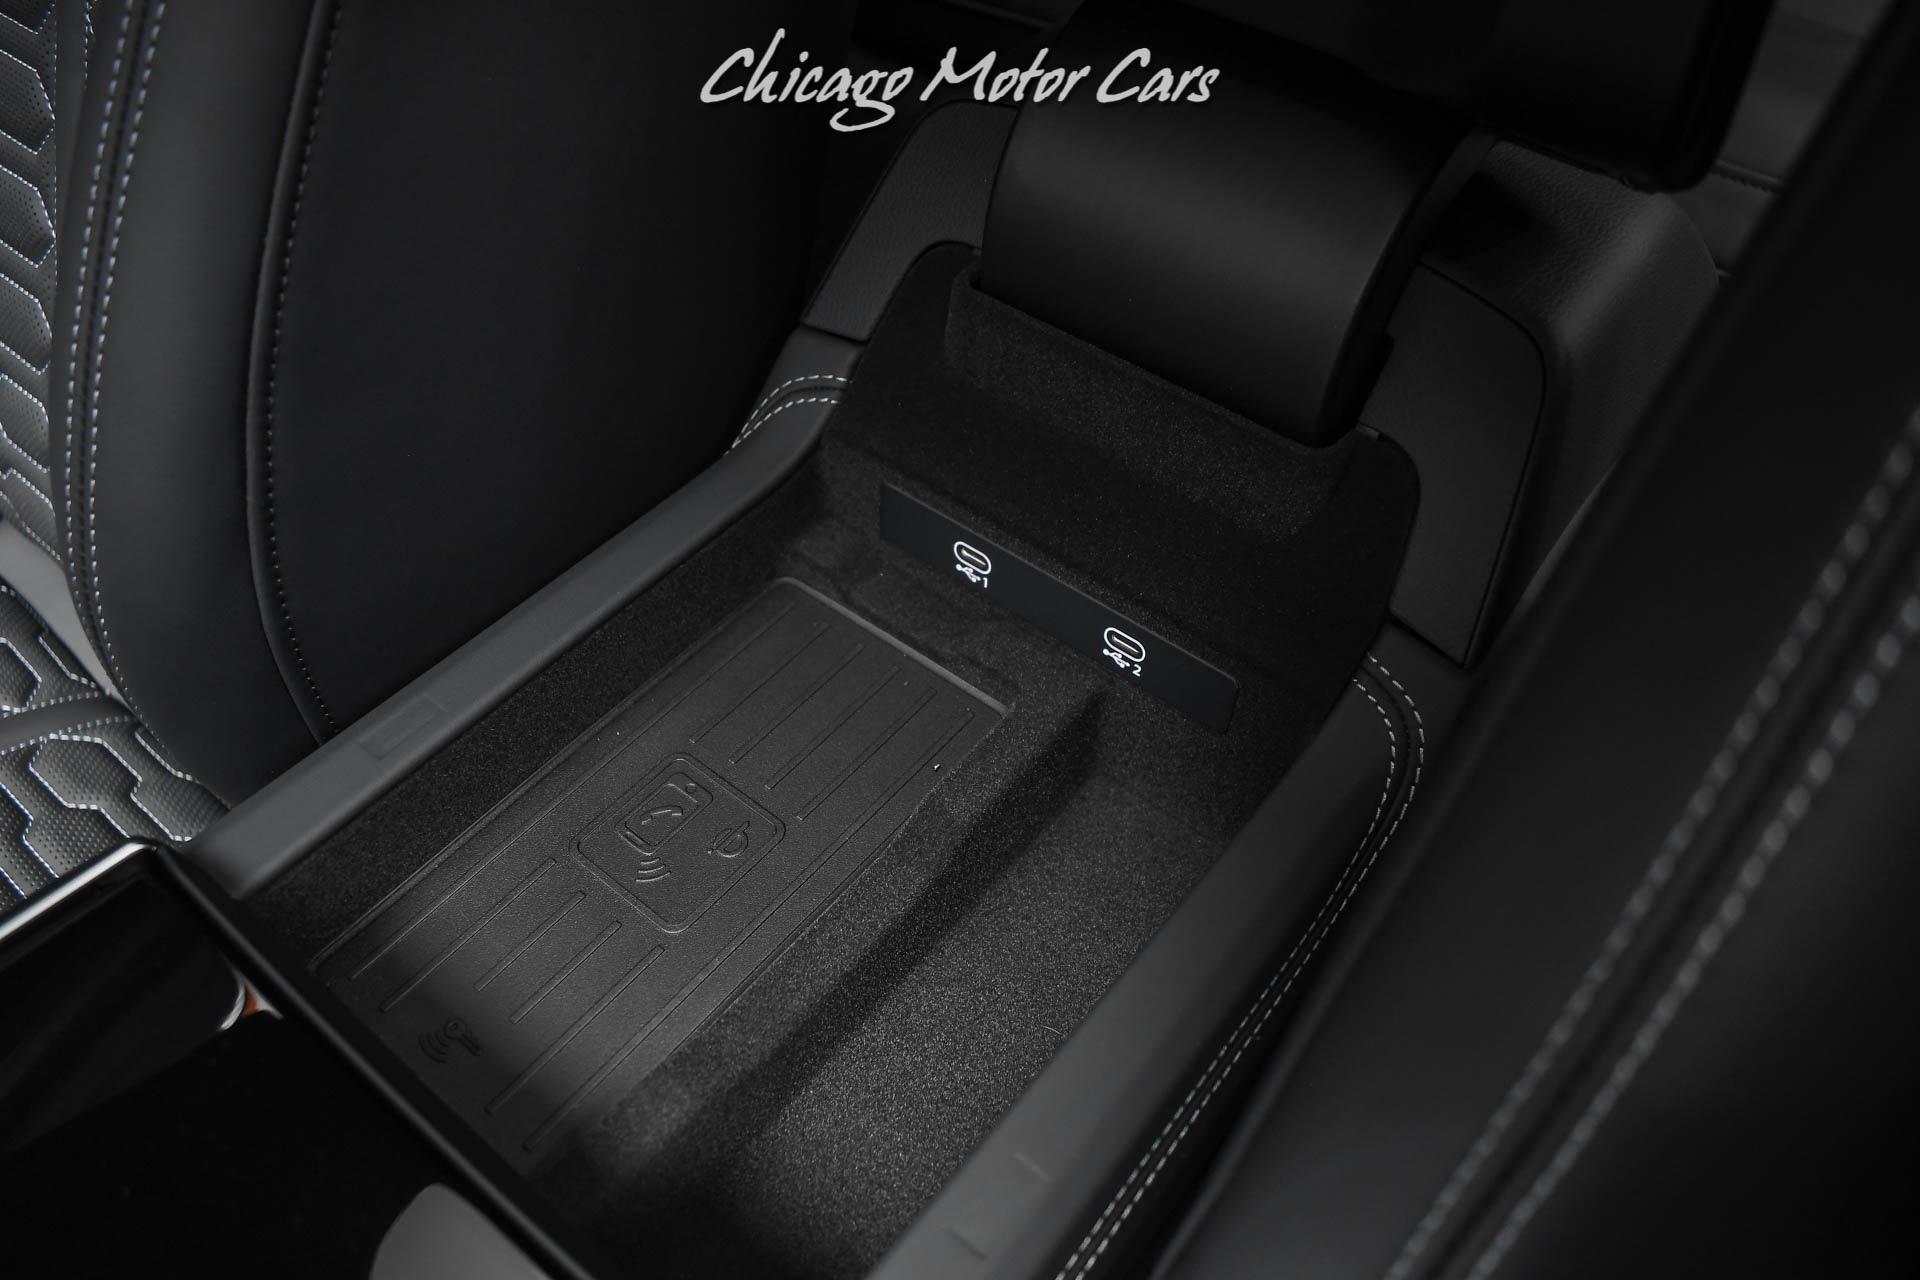 Used-2021-Audi-RS6-40T-quattro-Avant-BLACK-OPTIC-PKG-FULL-LEATHER-PKG-ONLY-30-MILES